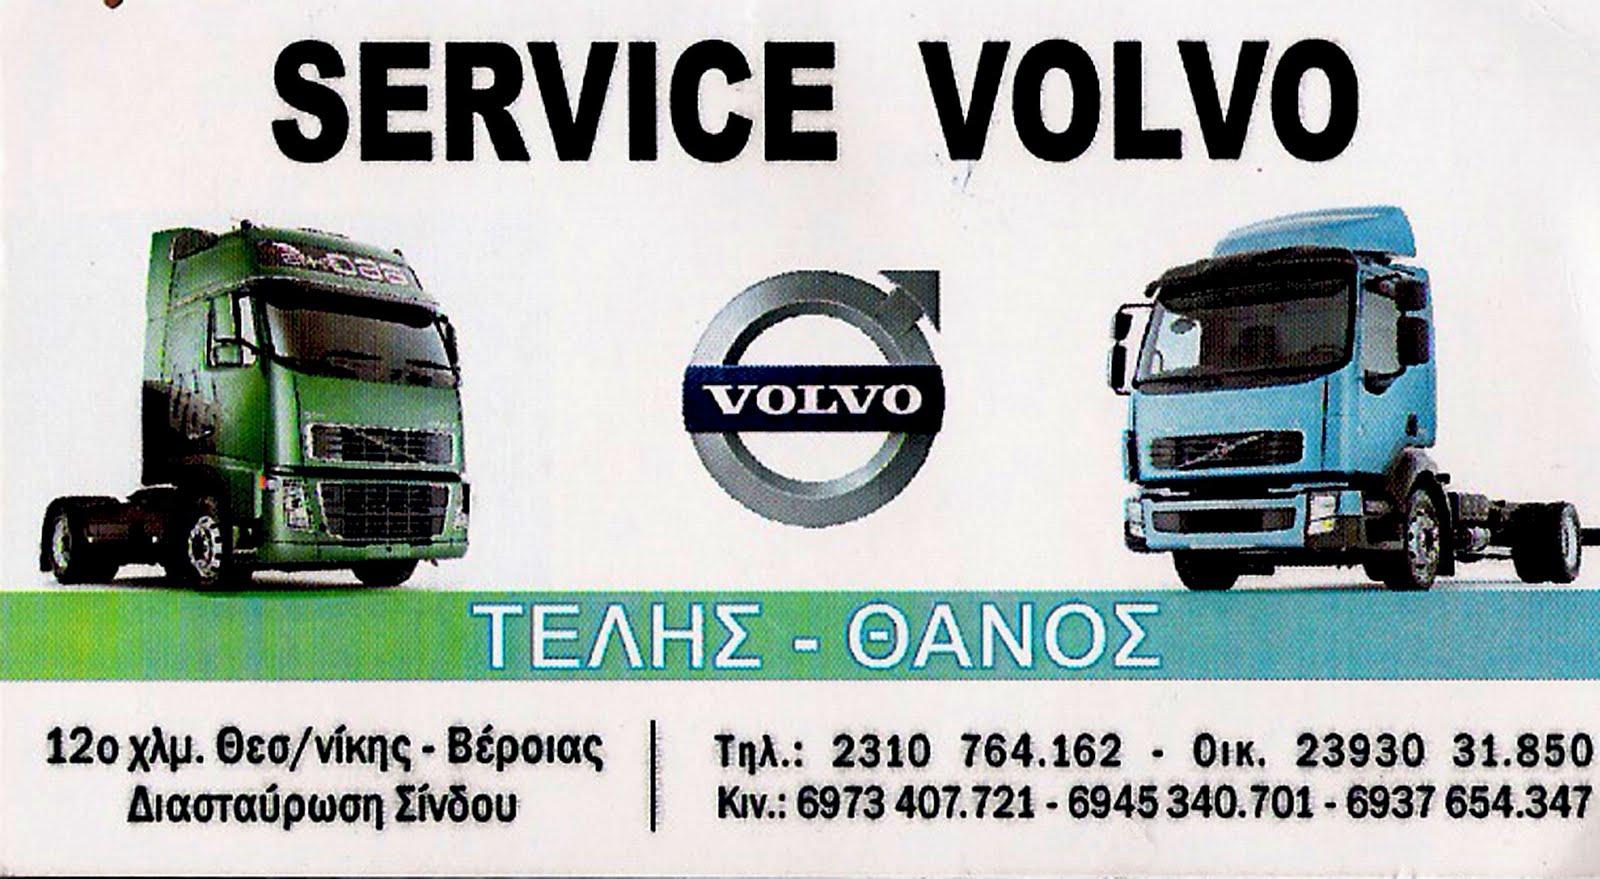 SERVICE VOLVO ΤΕΛΗΣ - ΘΑΝΟΣ